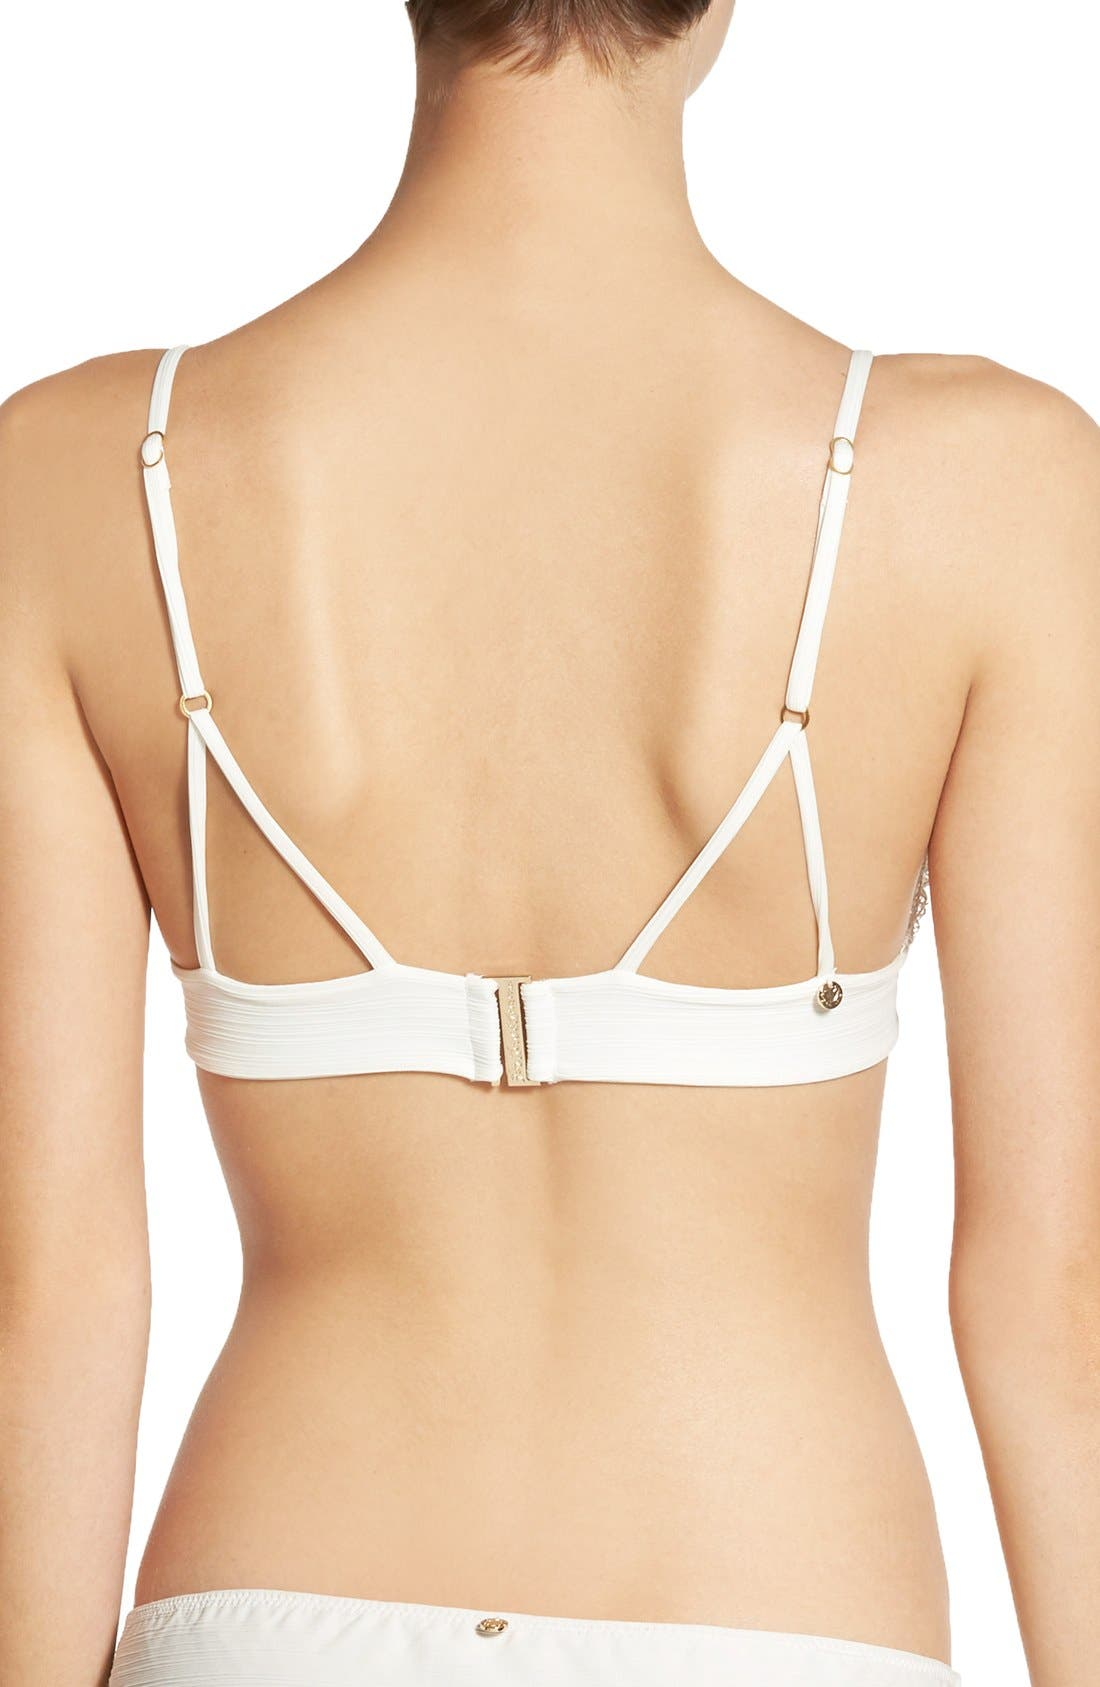 Alternate Image 2  - For Love & Lemons 'Maldives' Triangle Bikini Top